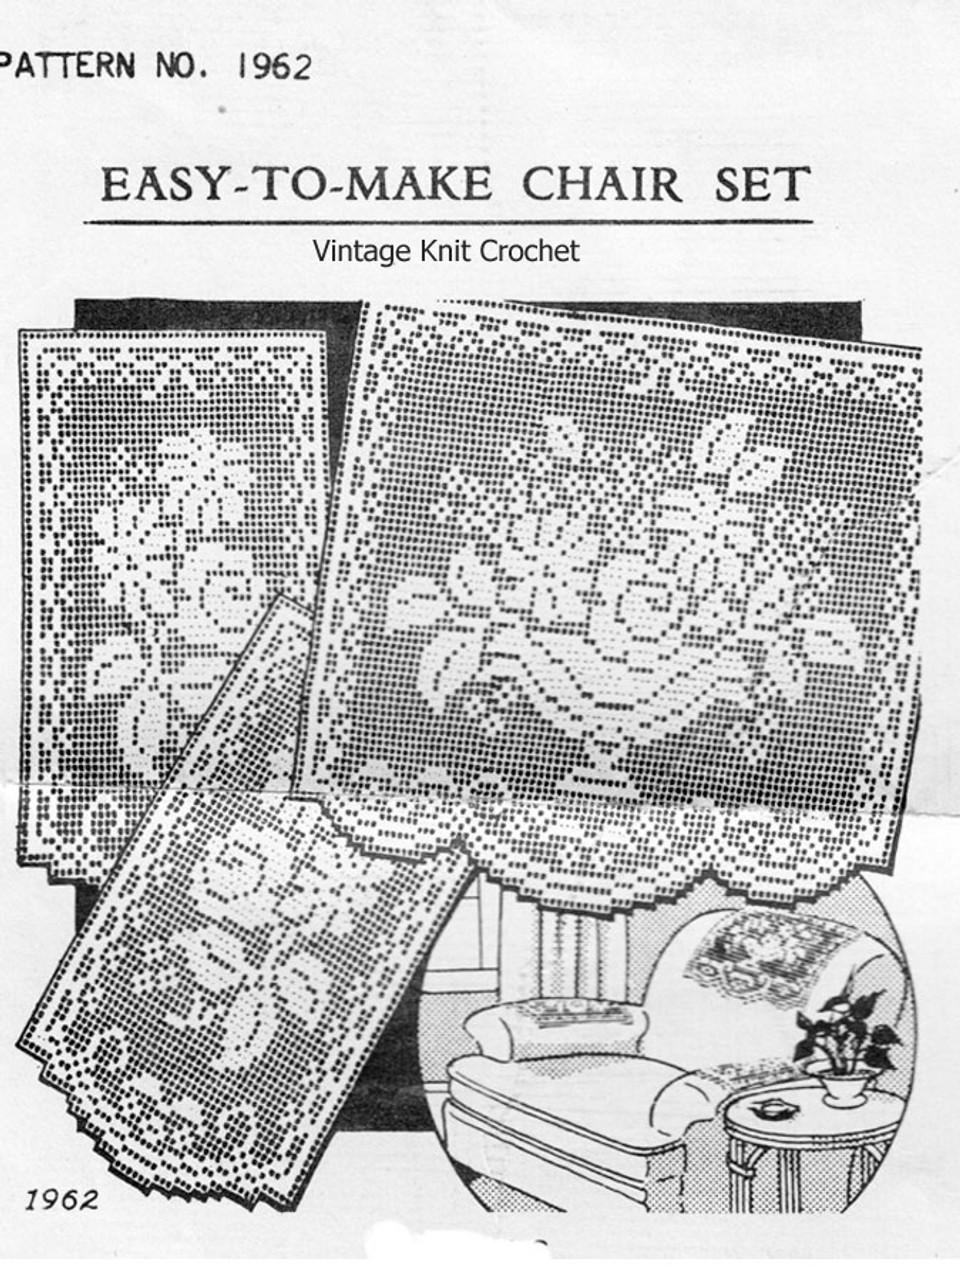 Vintage Filet Crochet Flower Urn Chair Set Pattern No 1962